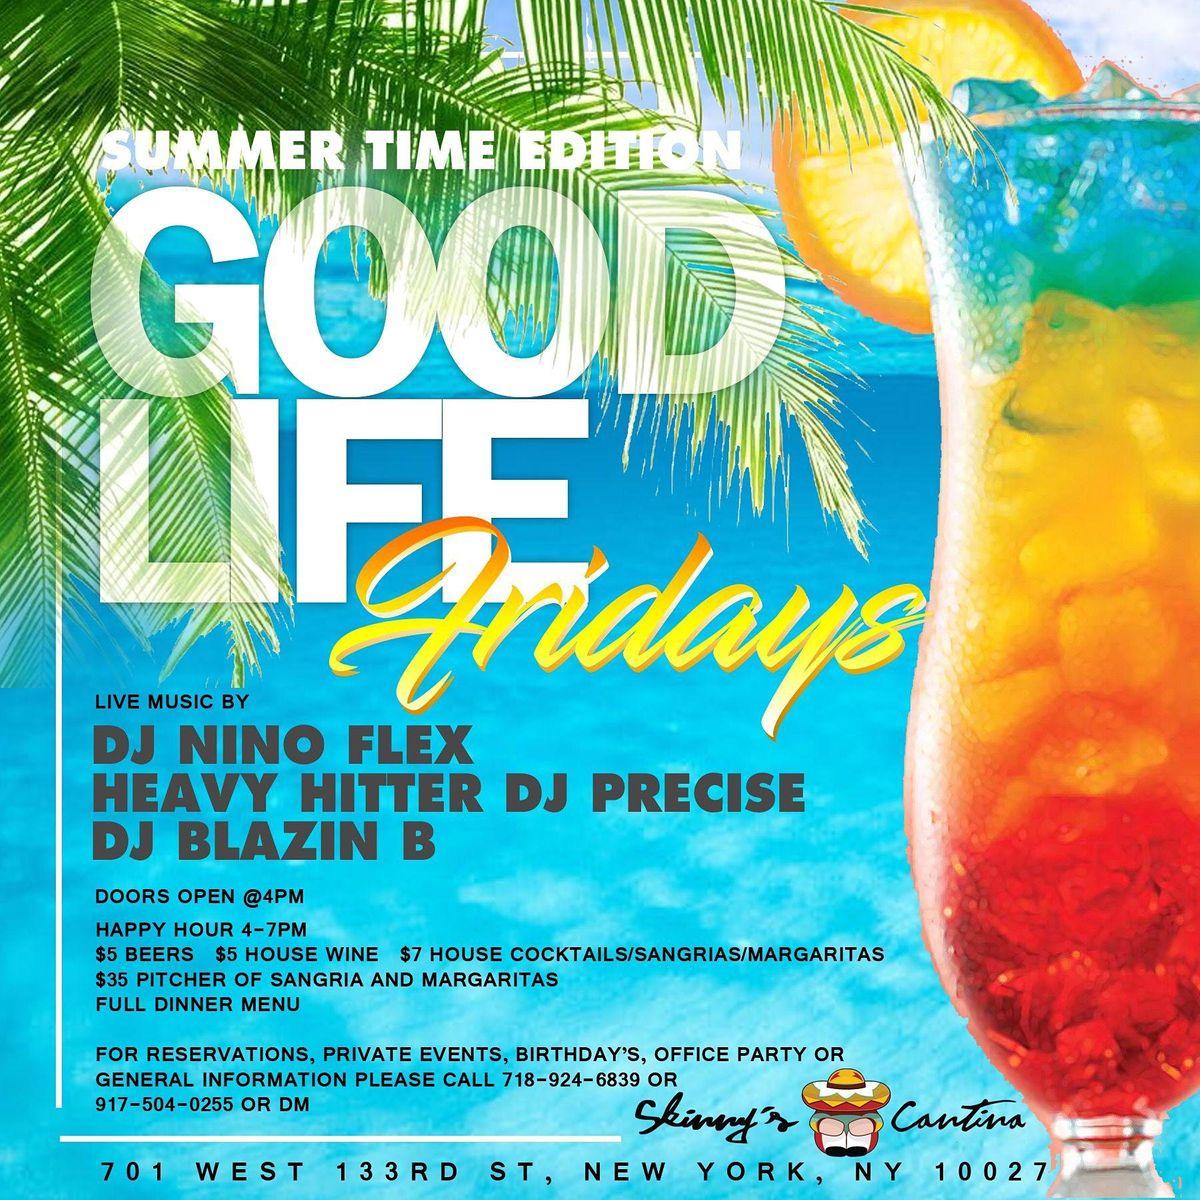 Summer Time Good Life Fridays at Skinny's Cantina